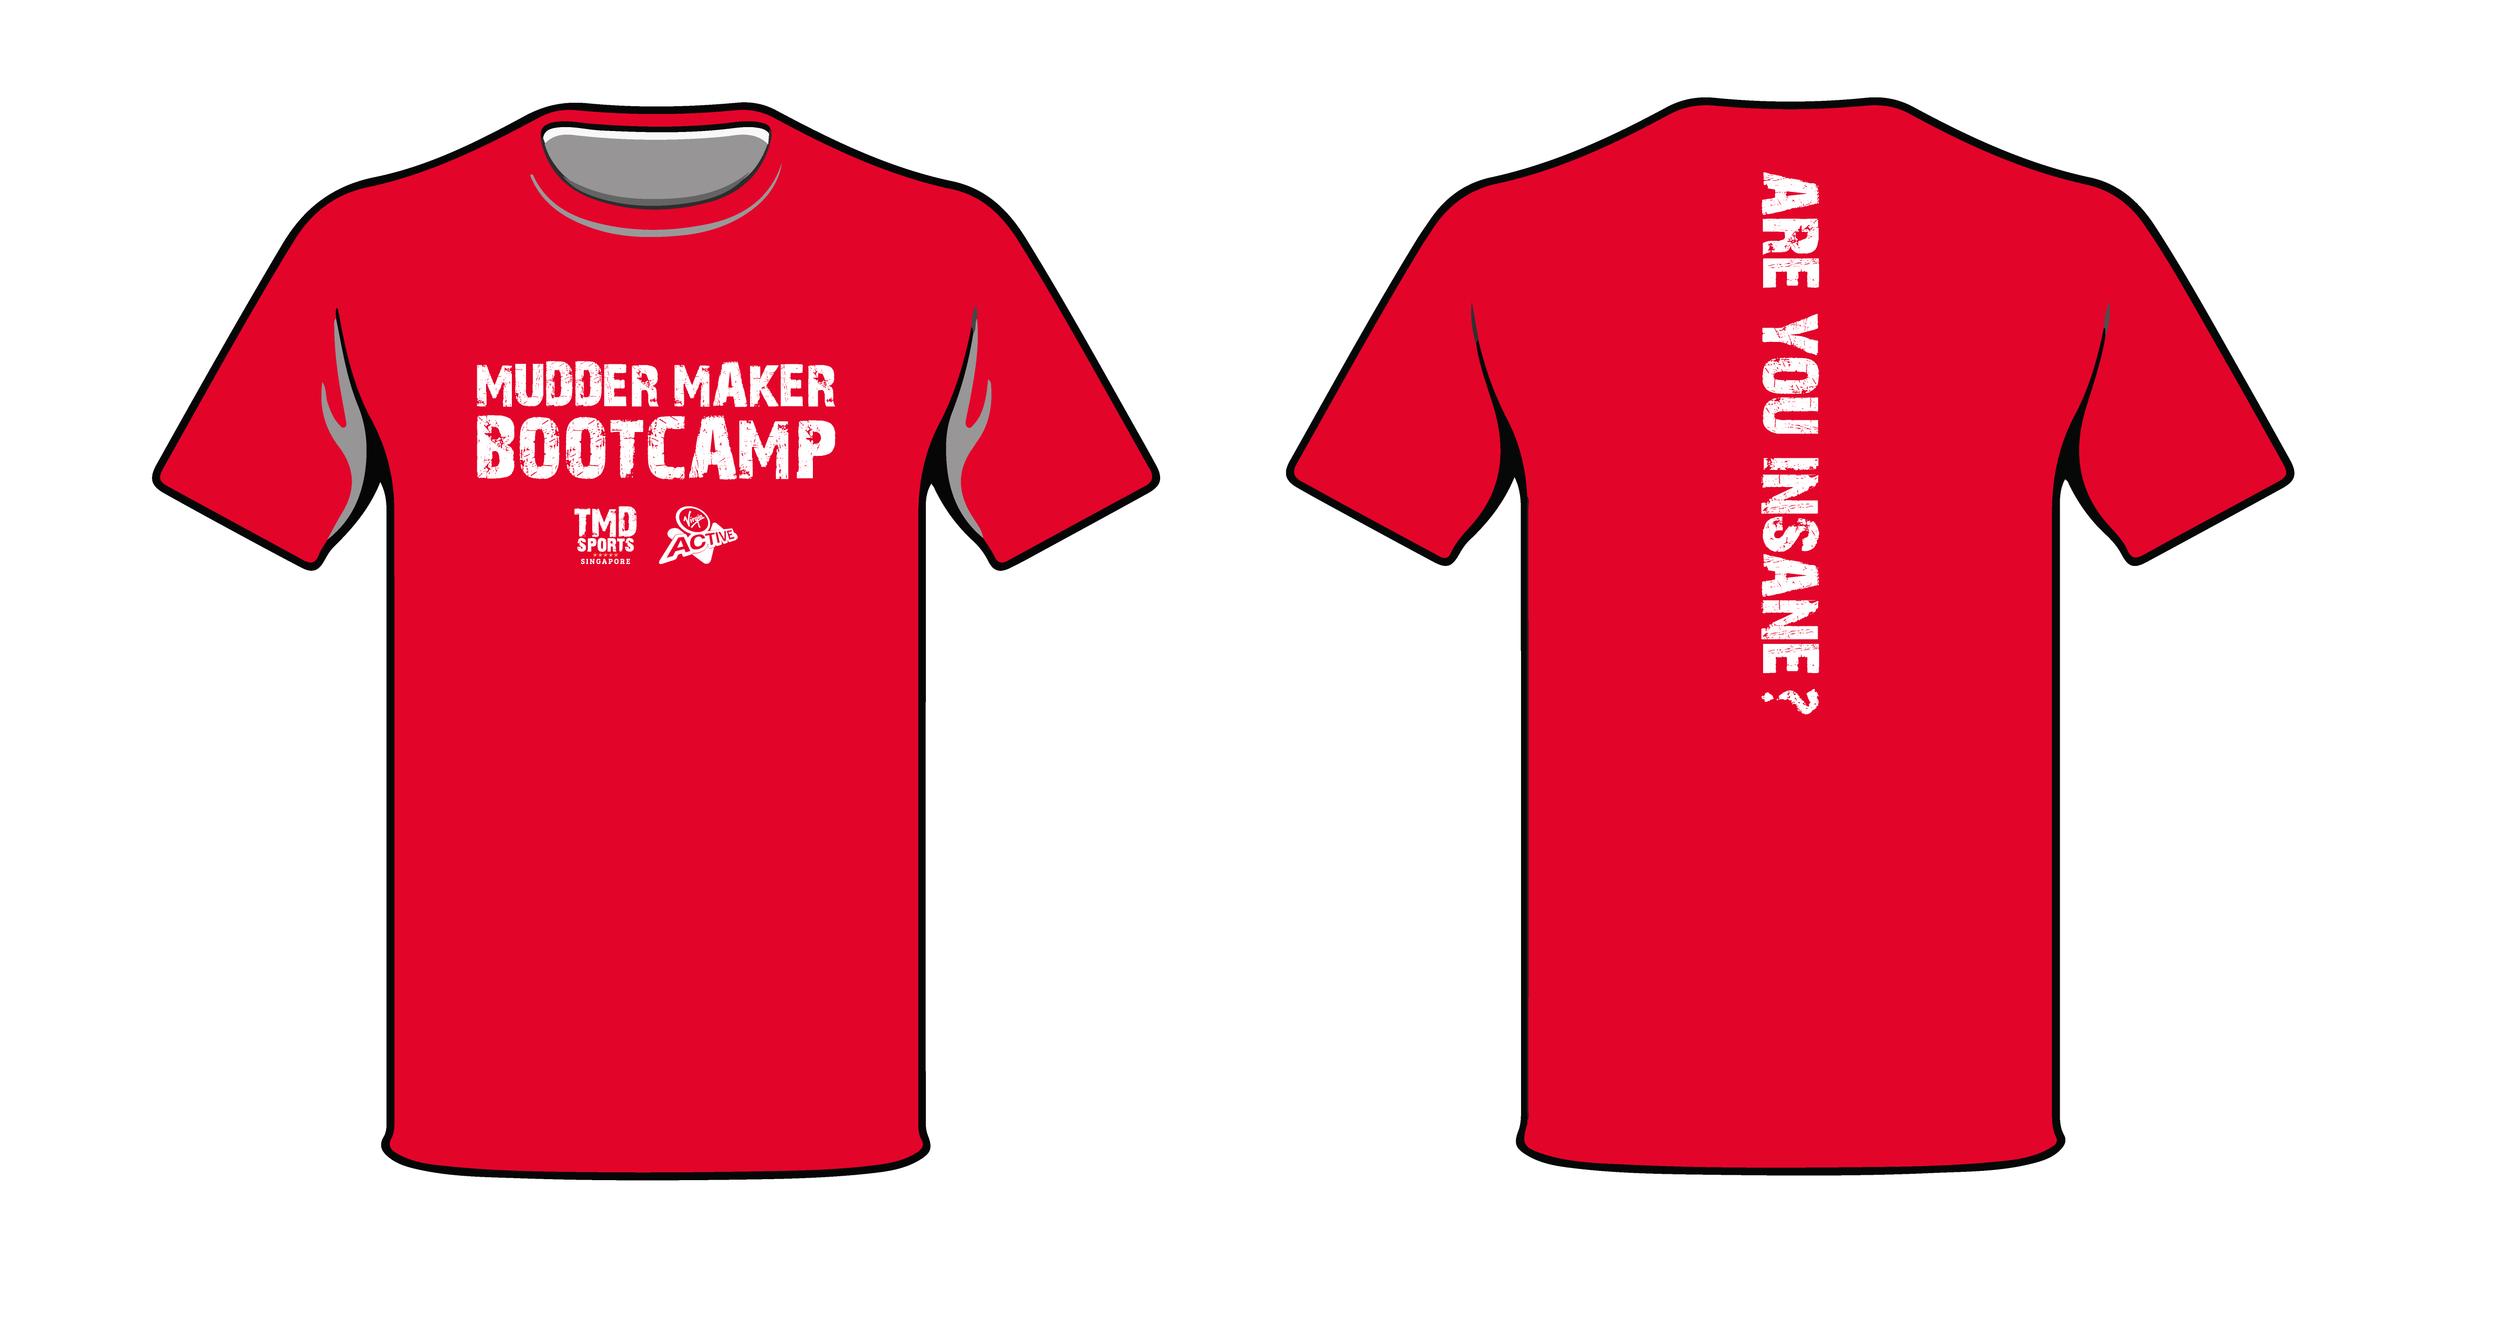 Virgin Active TMDsports Mudder Maker Bootcamp T-shirt